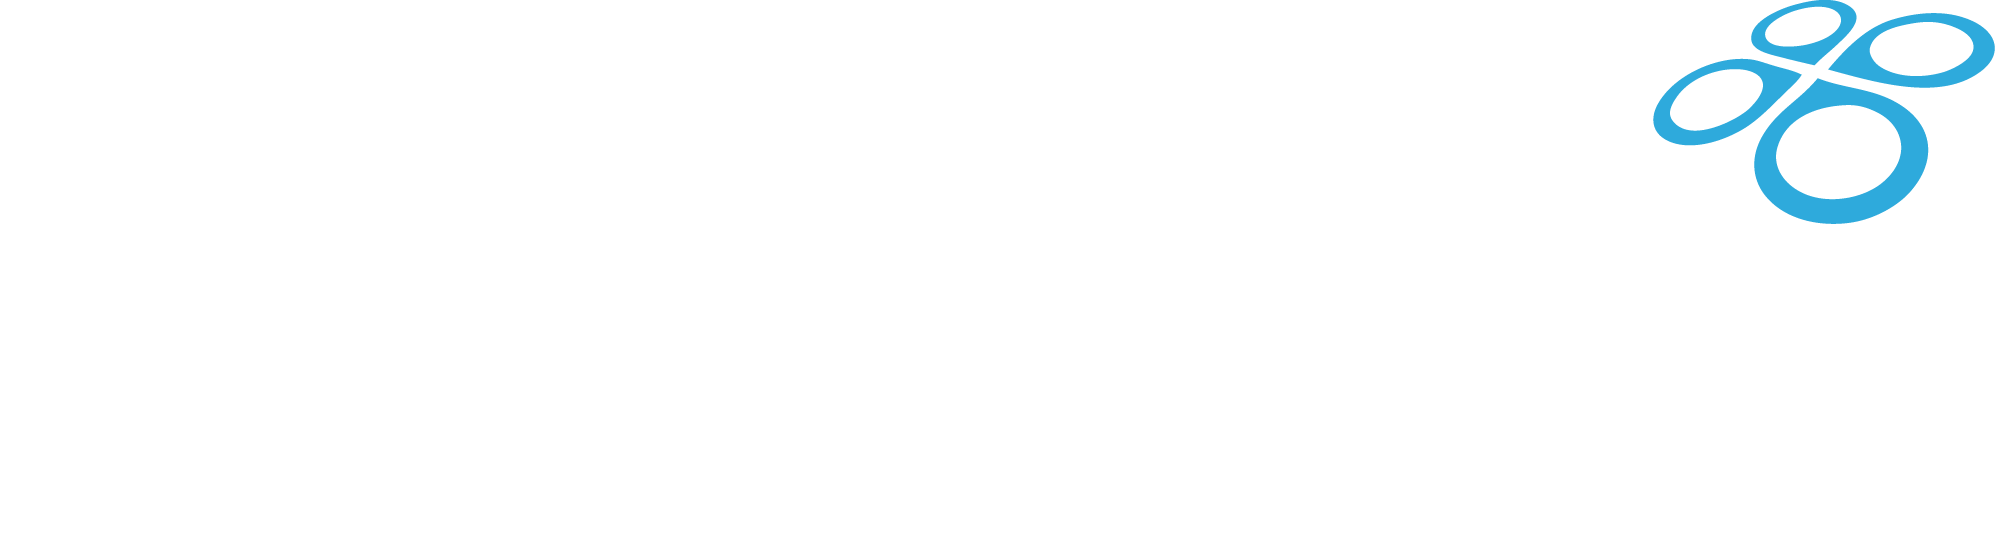 vistadrone.ch